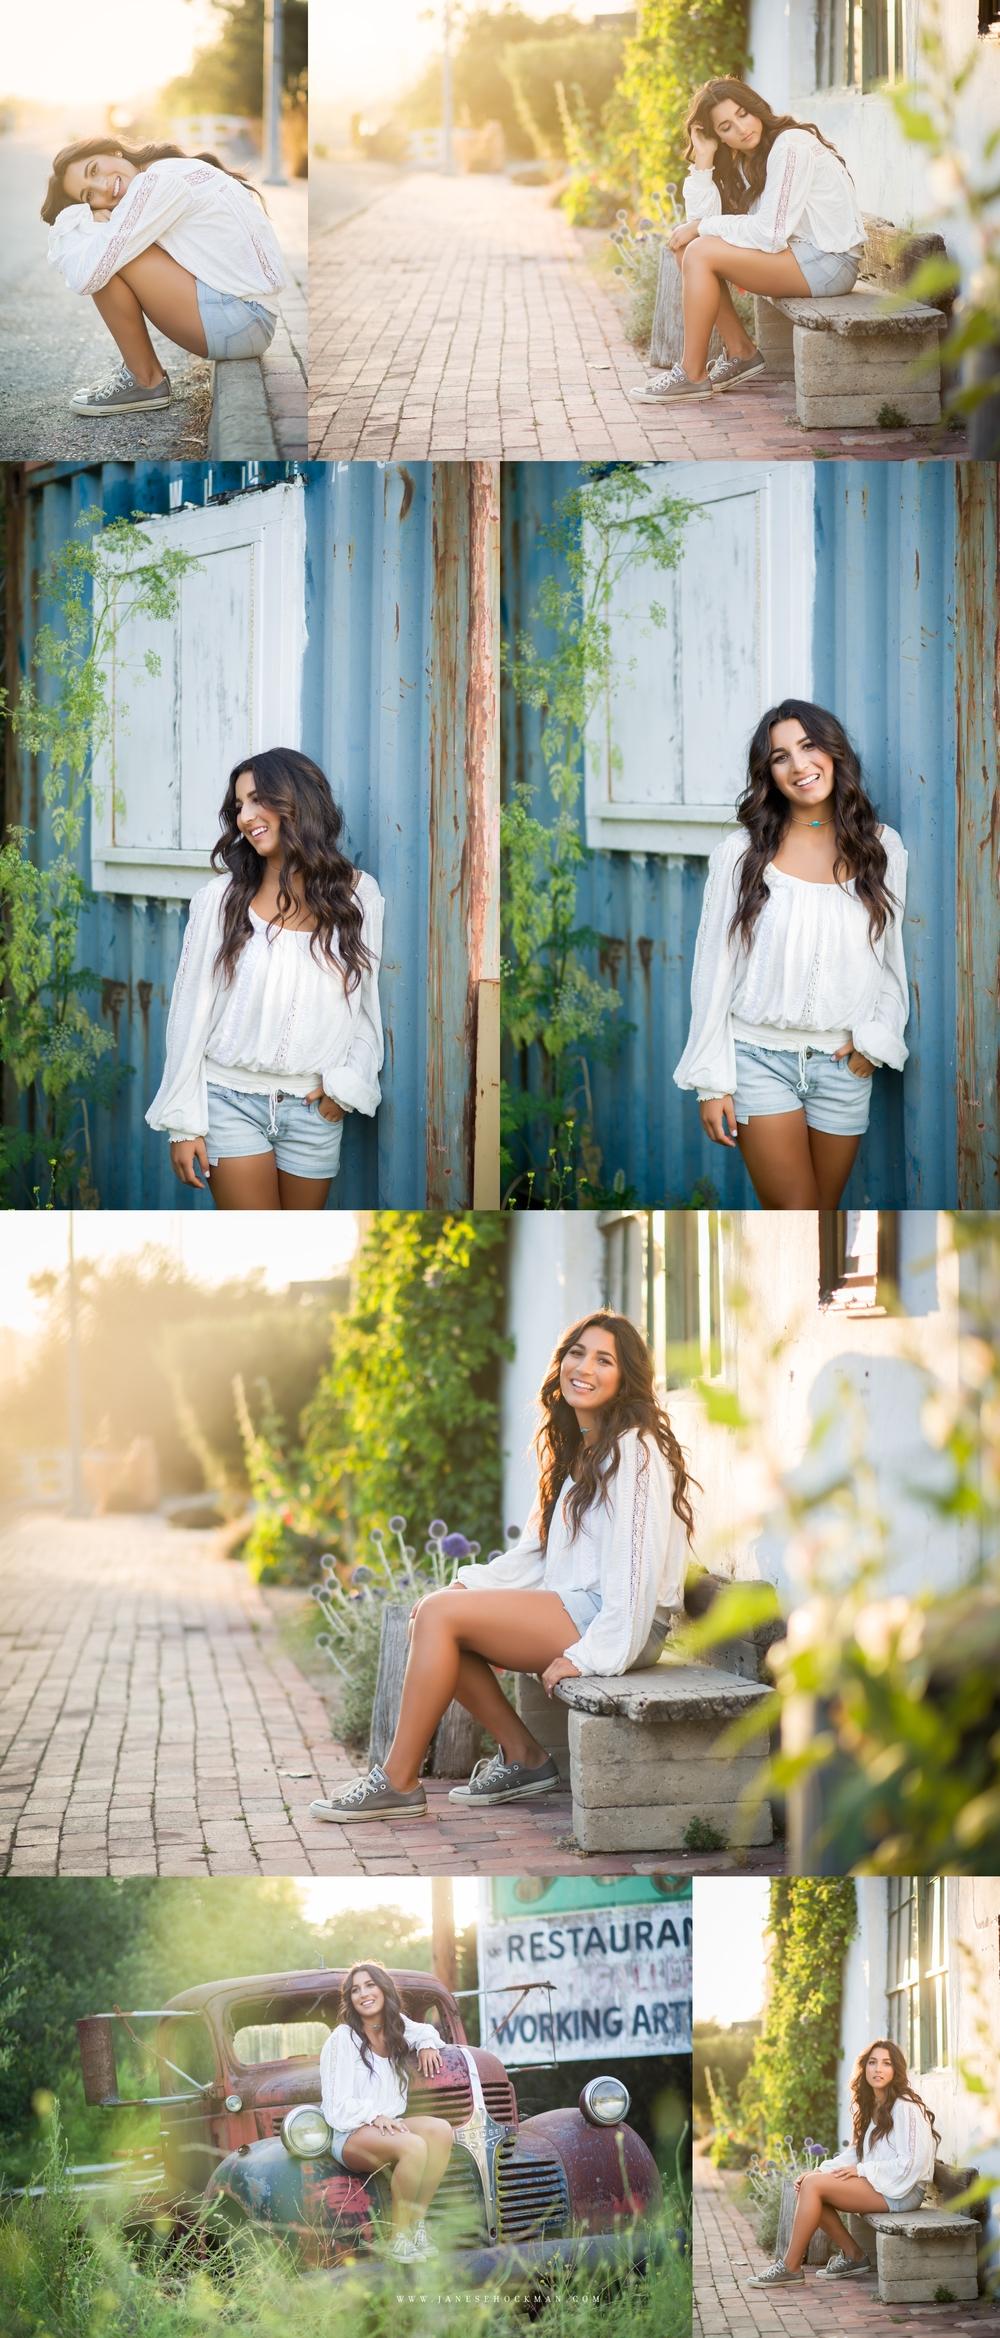 Miriam Janese Hockman Photography San Luis Obispo California Senior Portraits 5.jpg